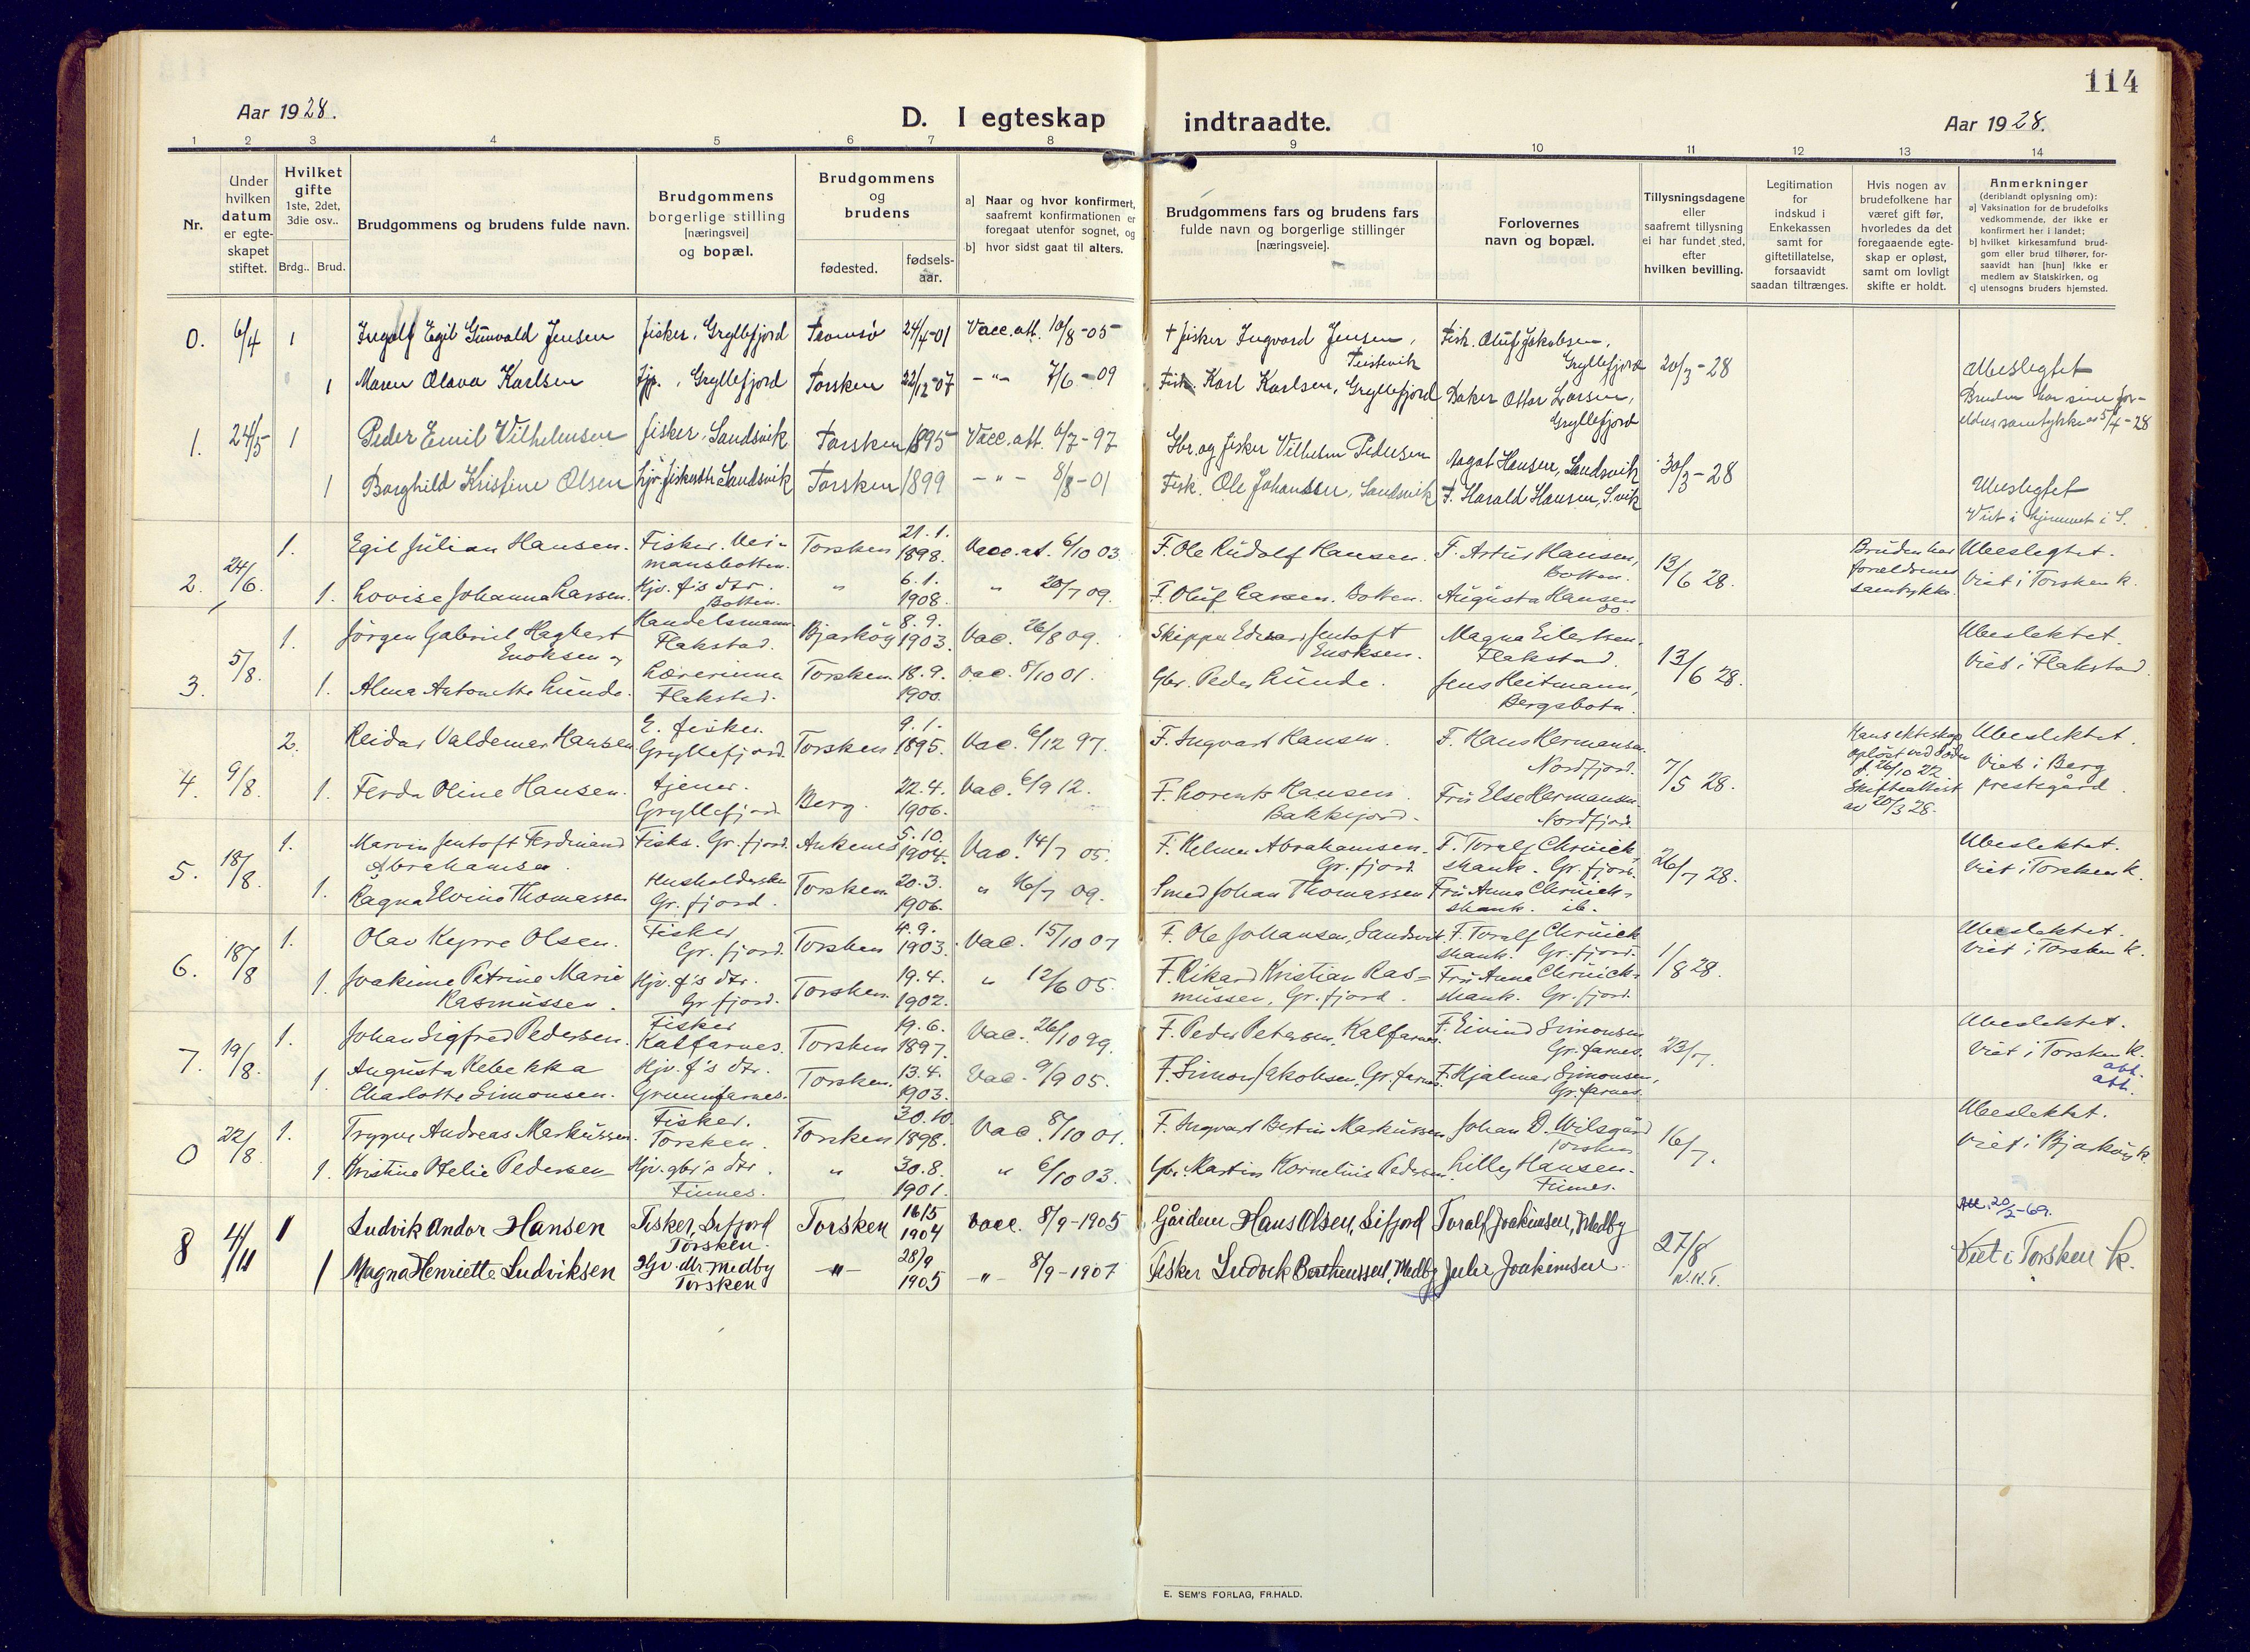 SATØ, Mefjord/Berg sokneprestkontor, G/Ga/Gaa: Ministerialbok nr. 10, 1916-1928, s. 114